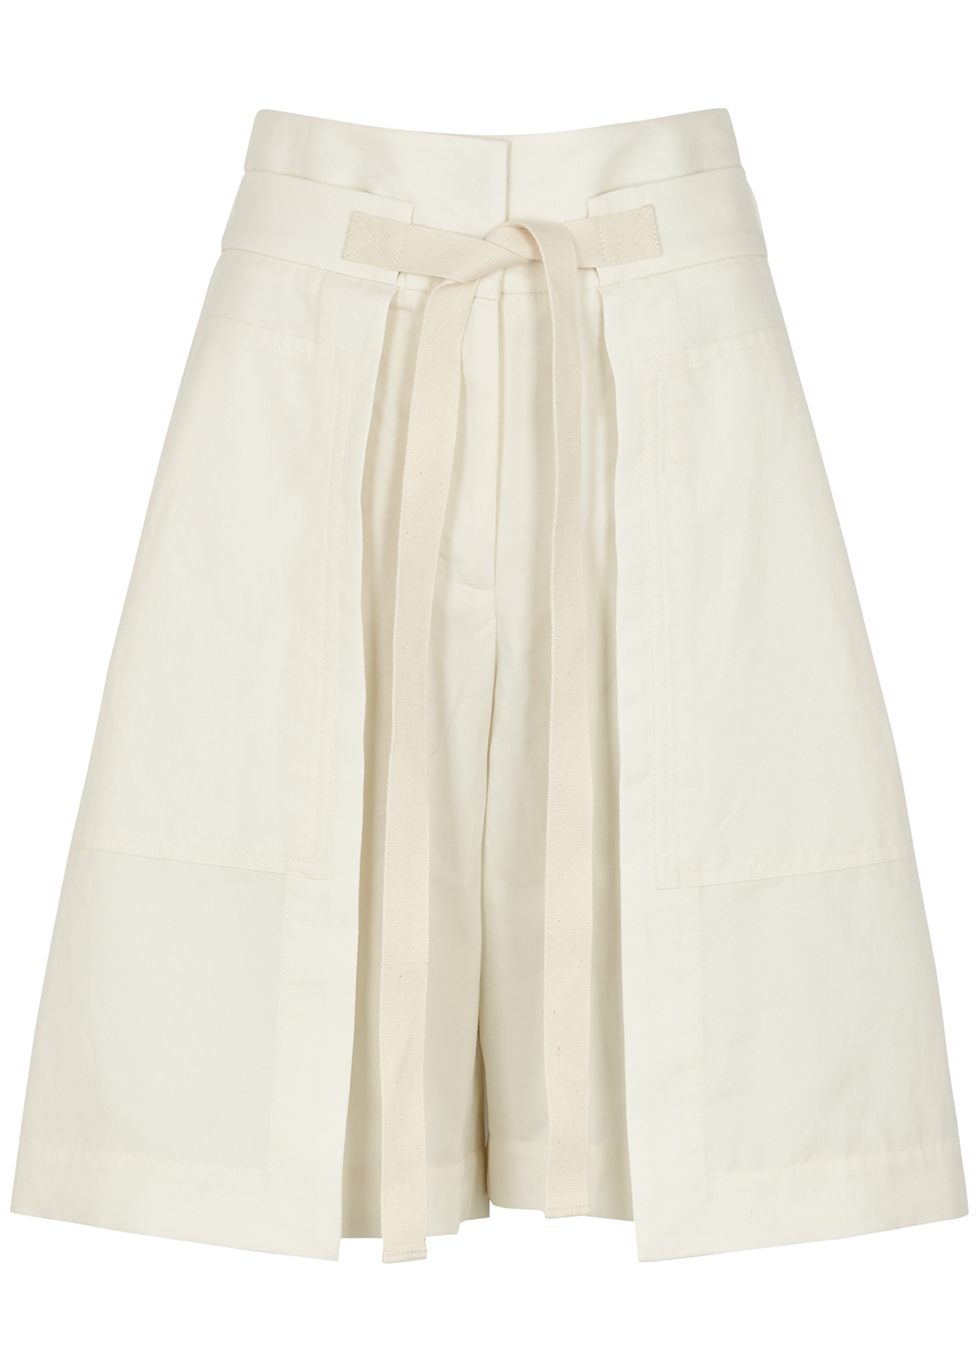 Powell off white linen-blend shorts